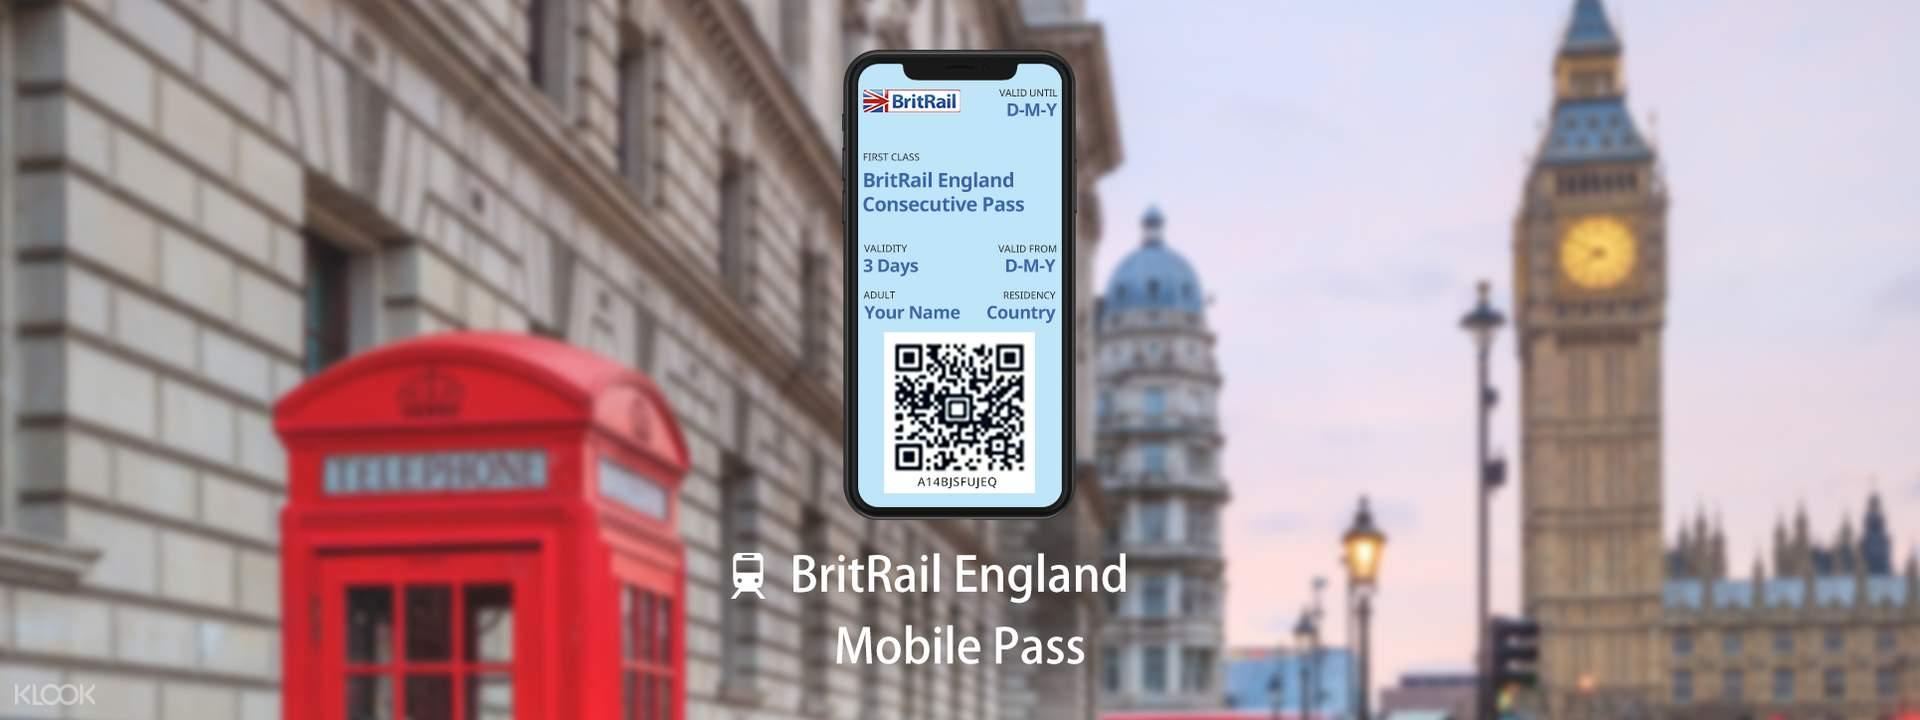 [E-Ticket] BritRail England Mobile Pass (Consecutive 3, 4